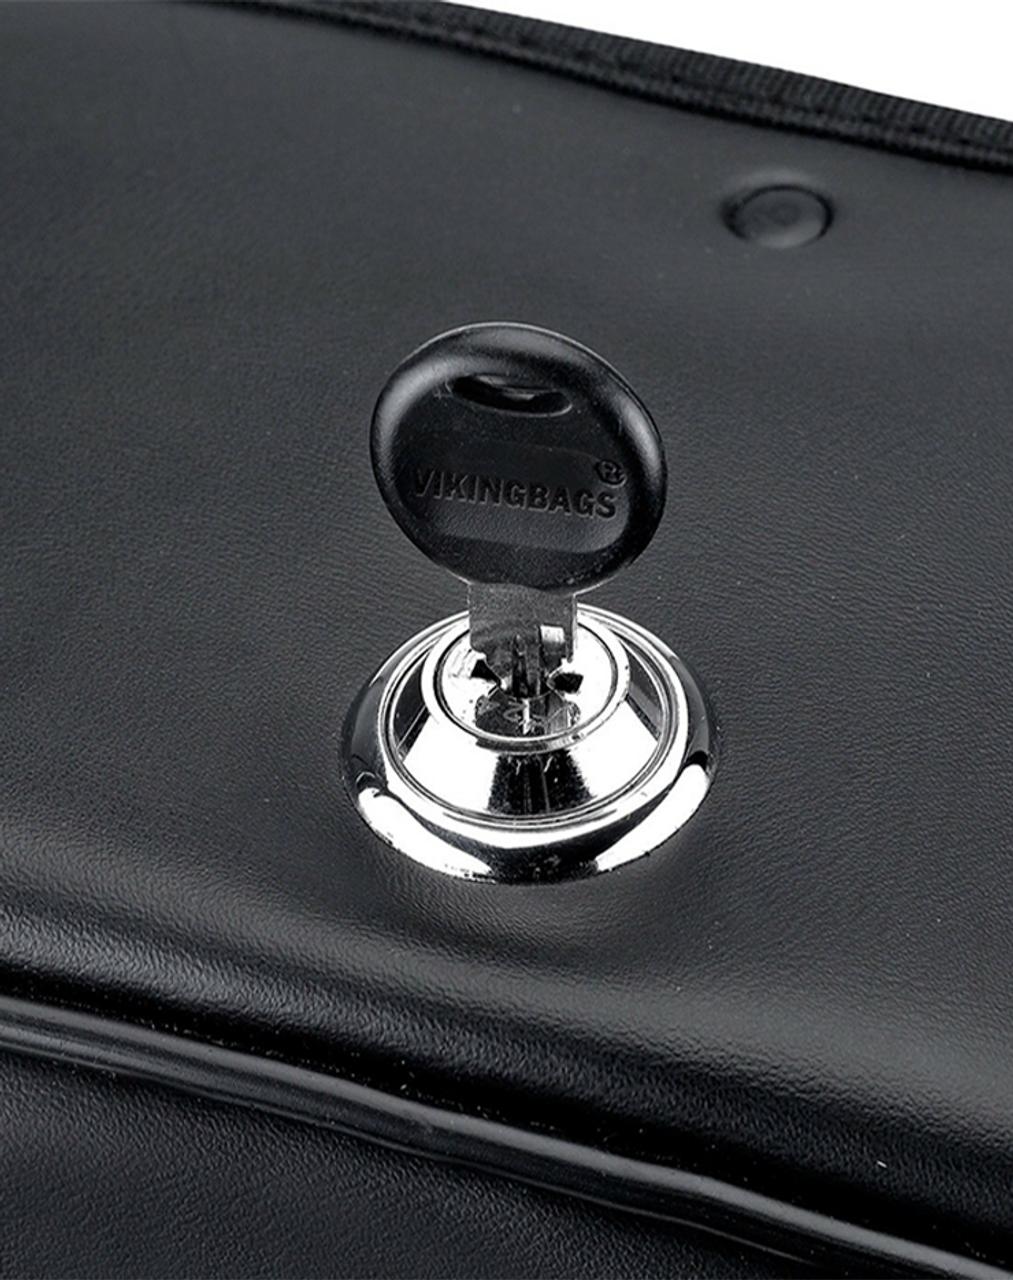 Triumph Thunderbird Shock Cutout Slanted Large Motorcycle Saddlebags Key Lock View